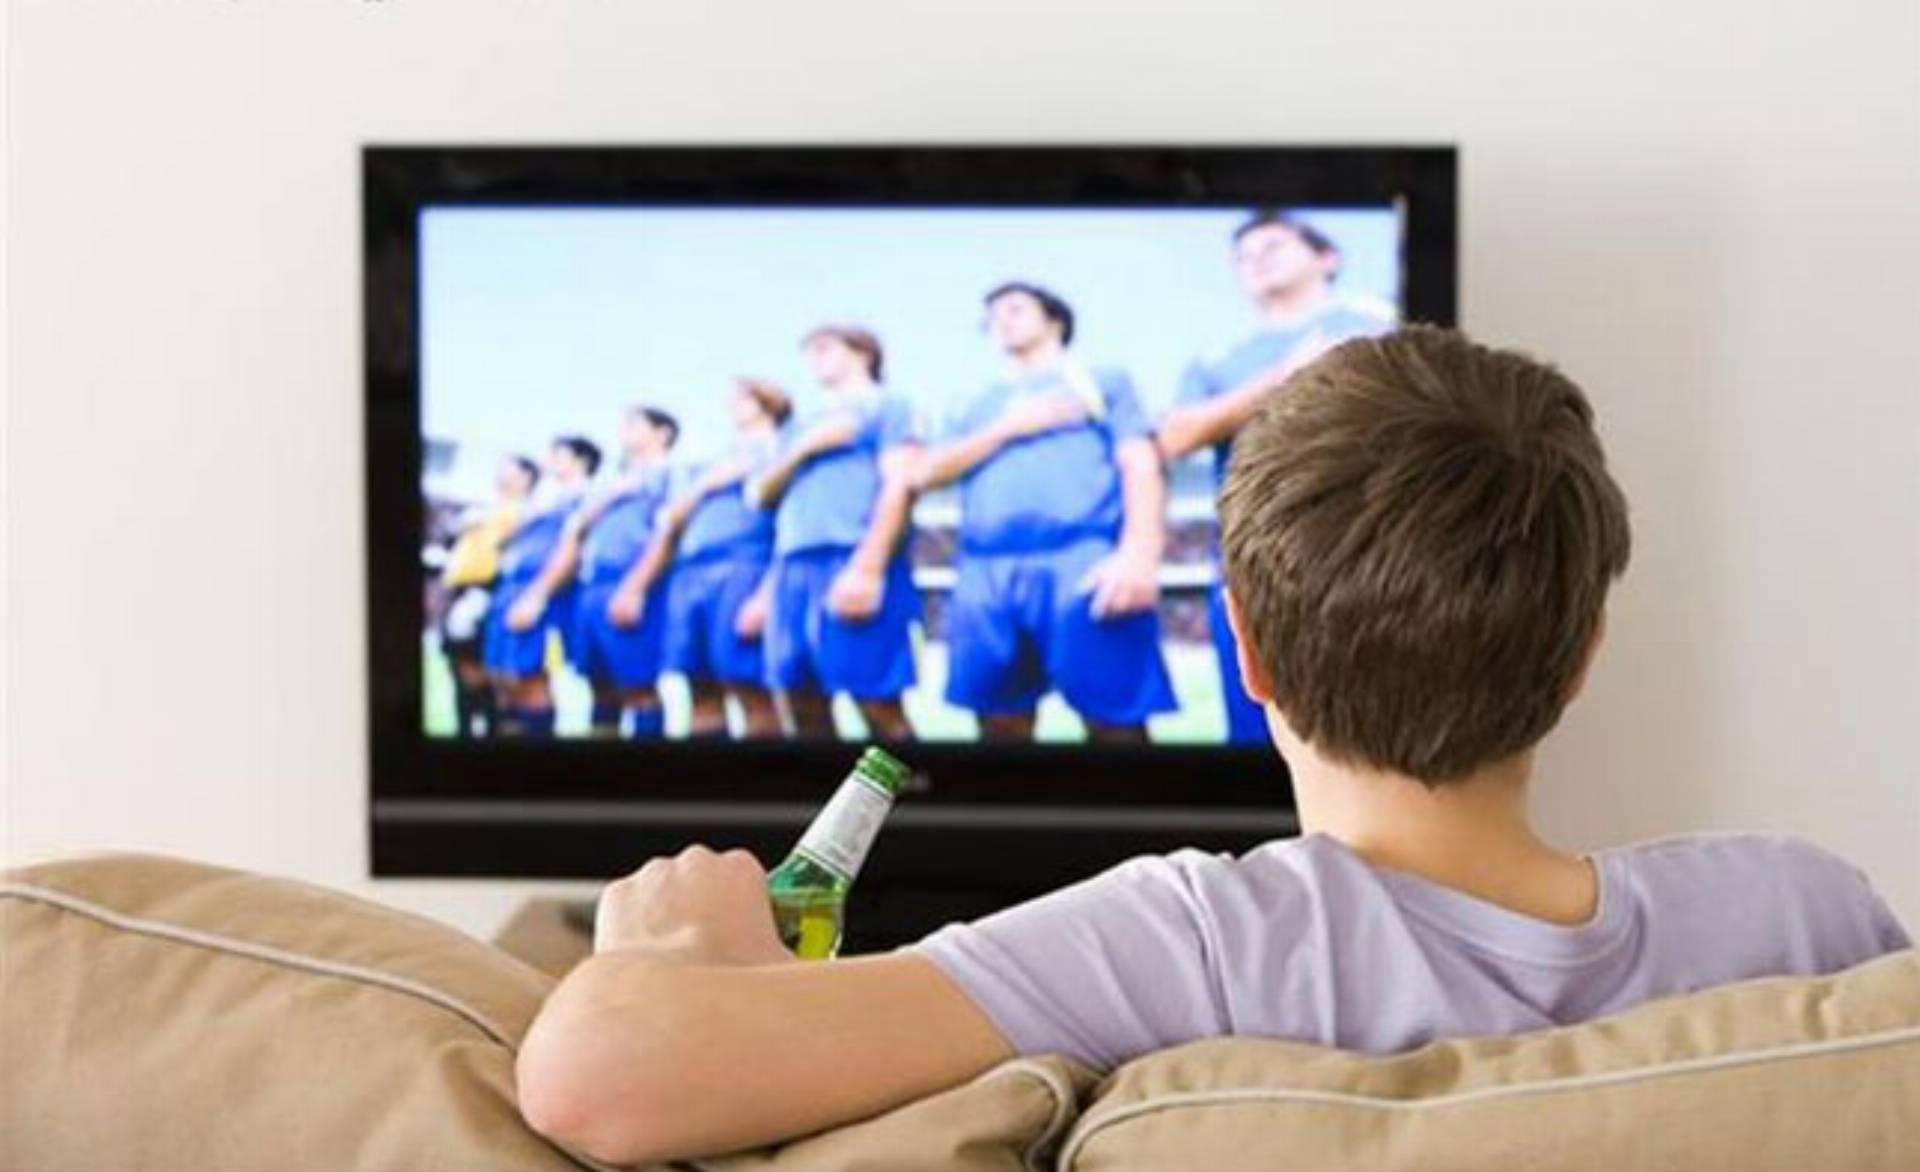 один знакомств сайт телевизор смотри не